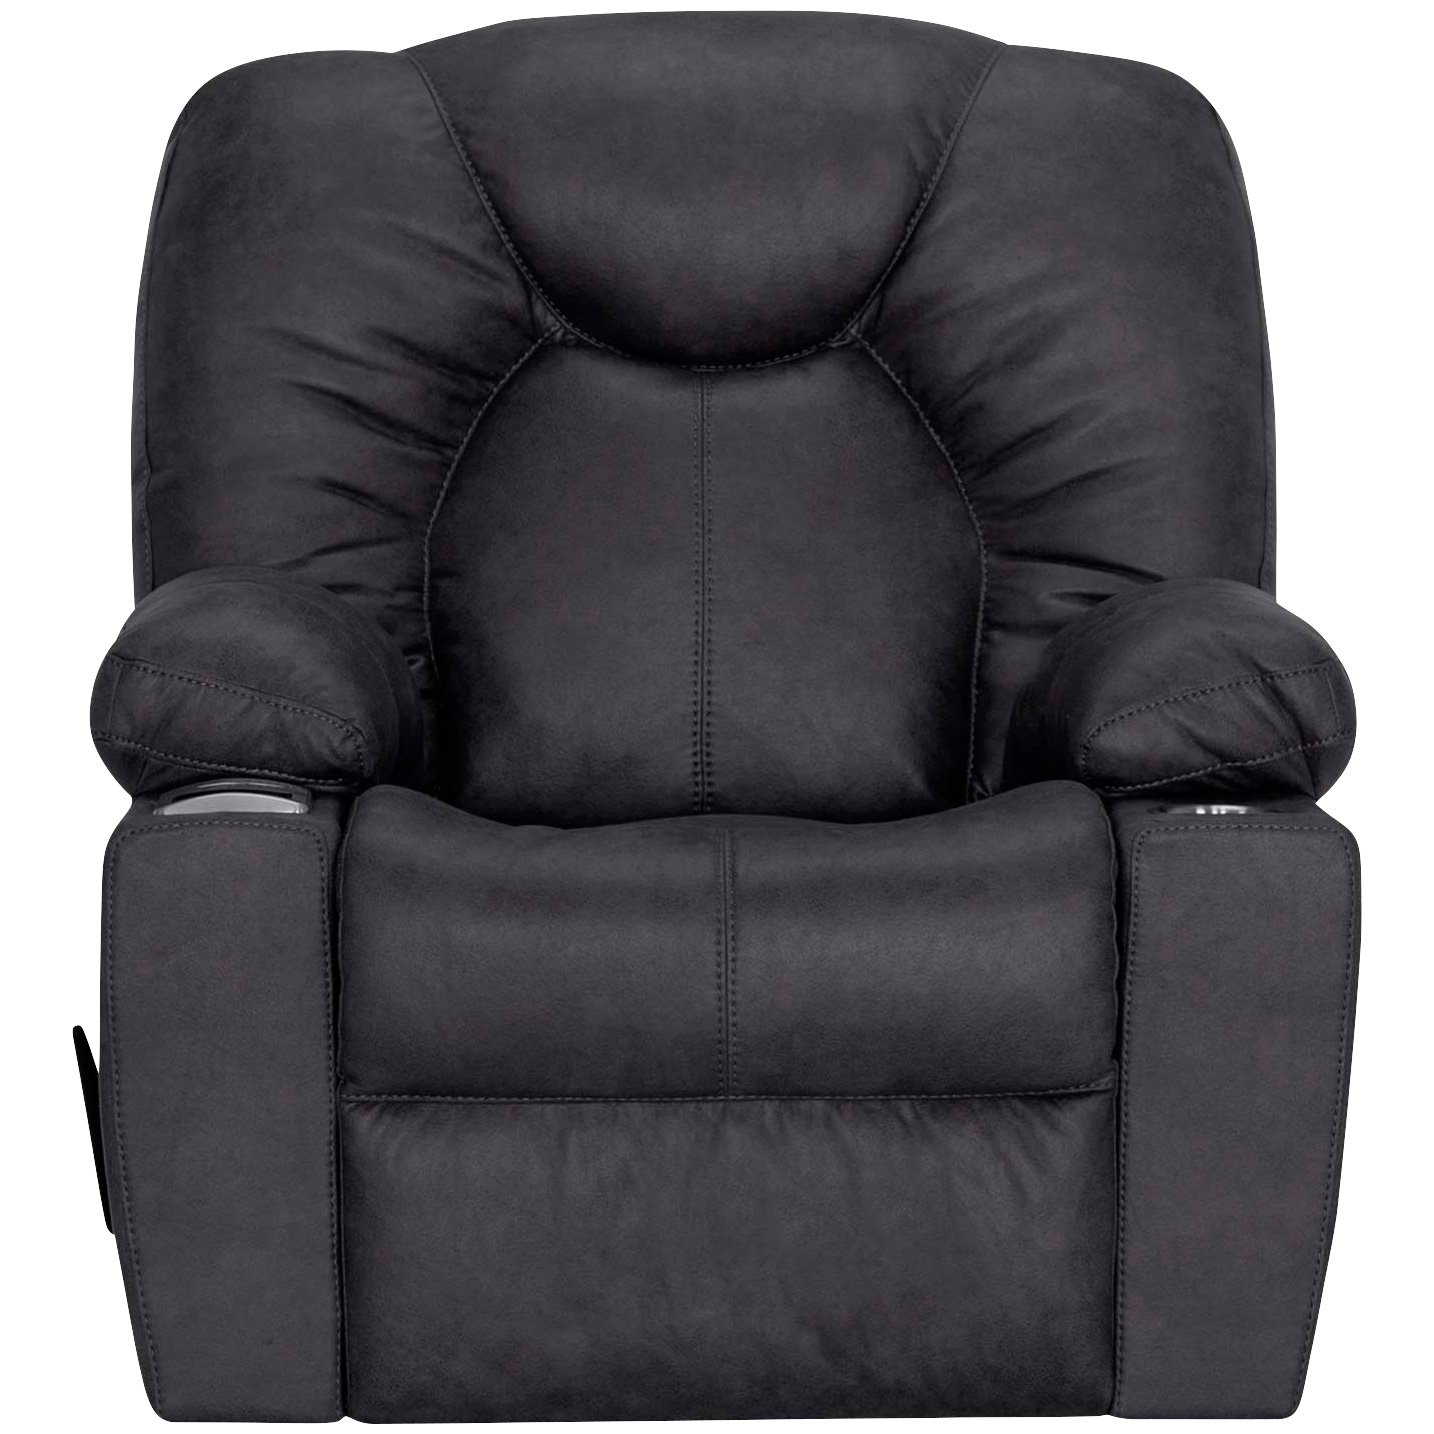 Franklin | Astro Steele Rocker Recliner Chair